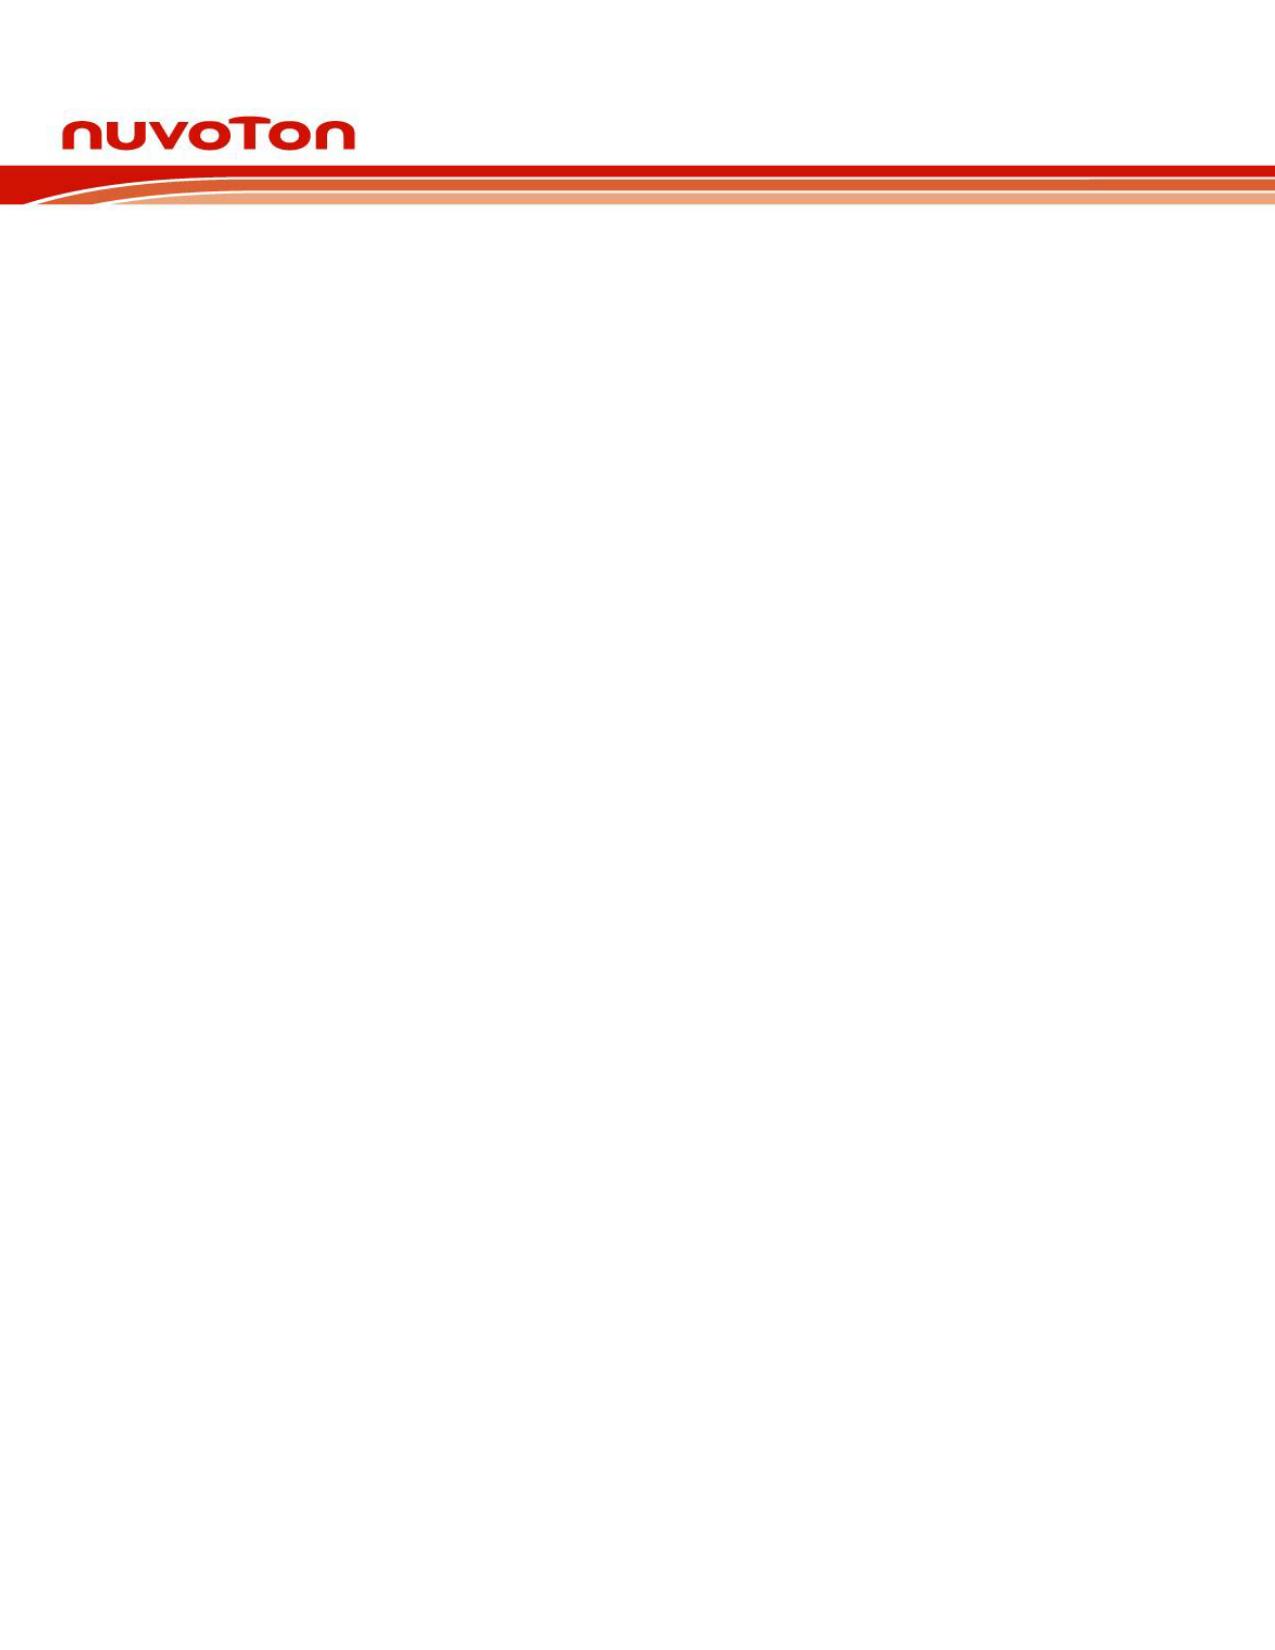 M052ZBN دیتاشیت PDF